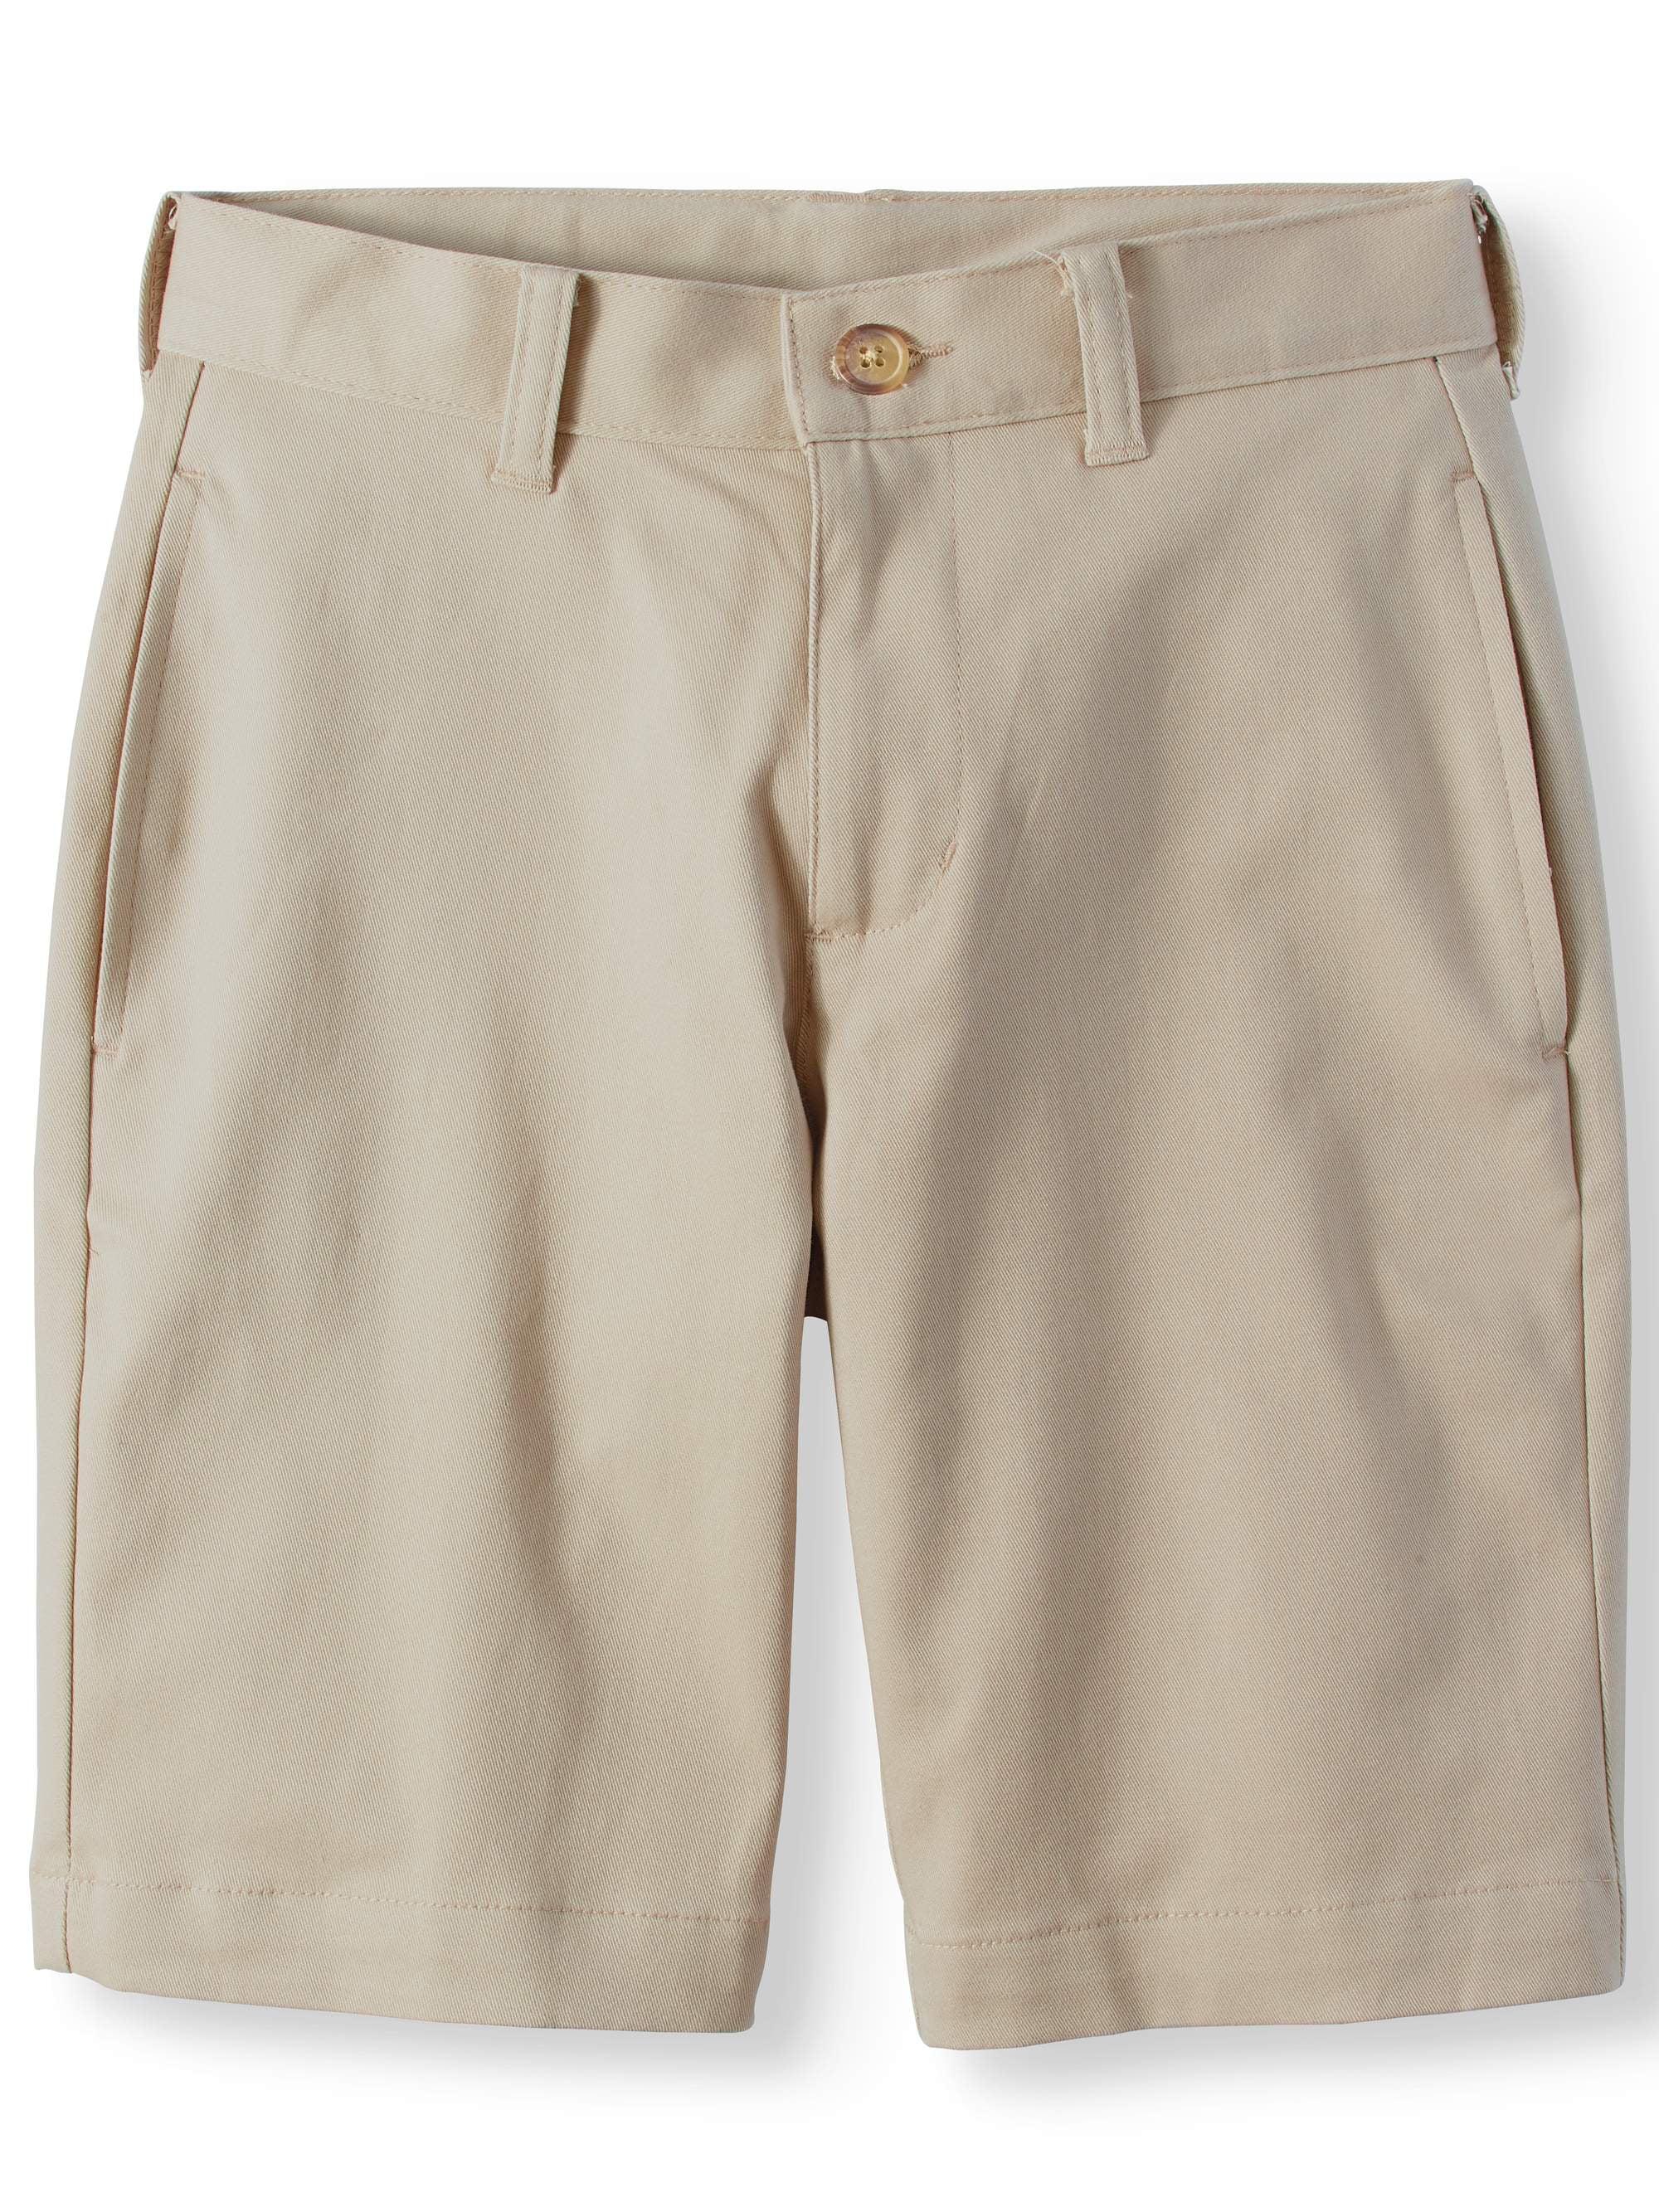 Boys Shorts George Bermuda Navy Blue Khaki  7 8 10 14 Husky 16 18 Flat front